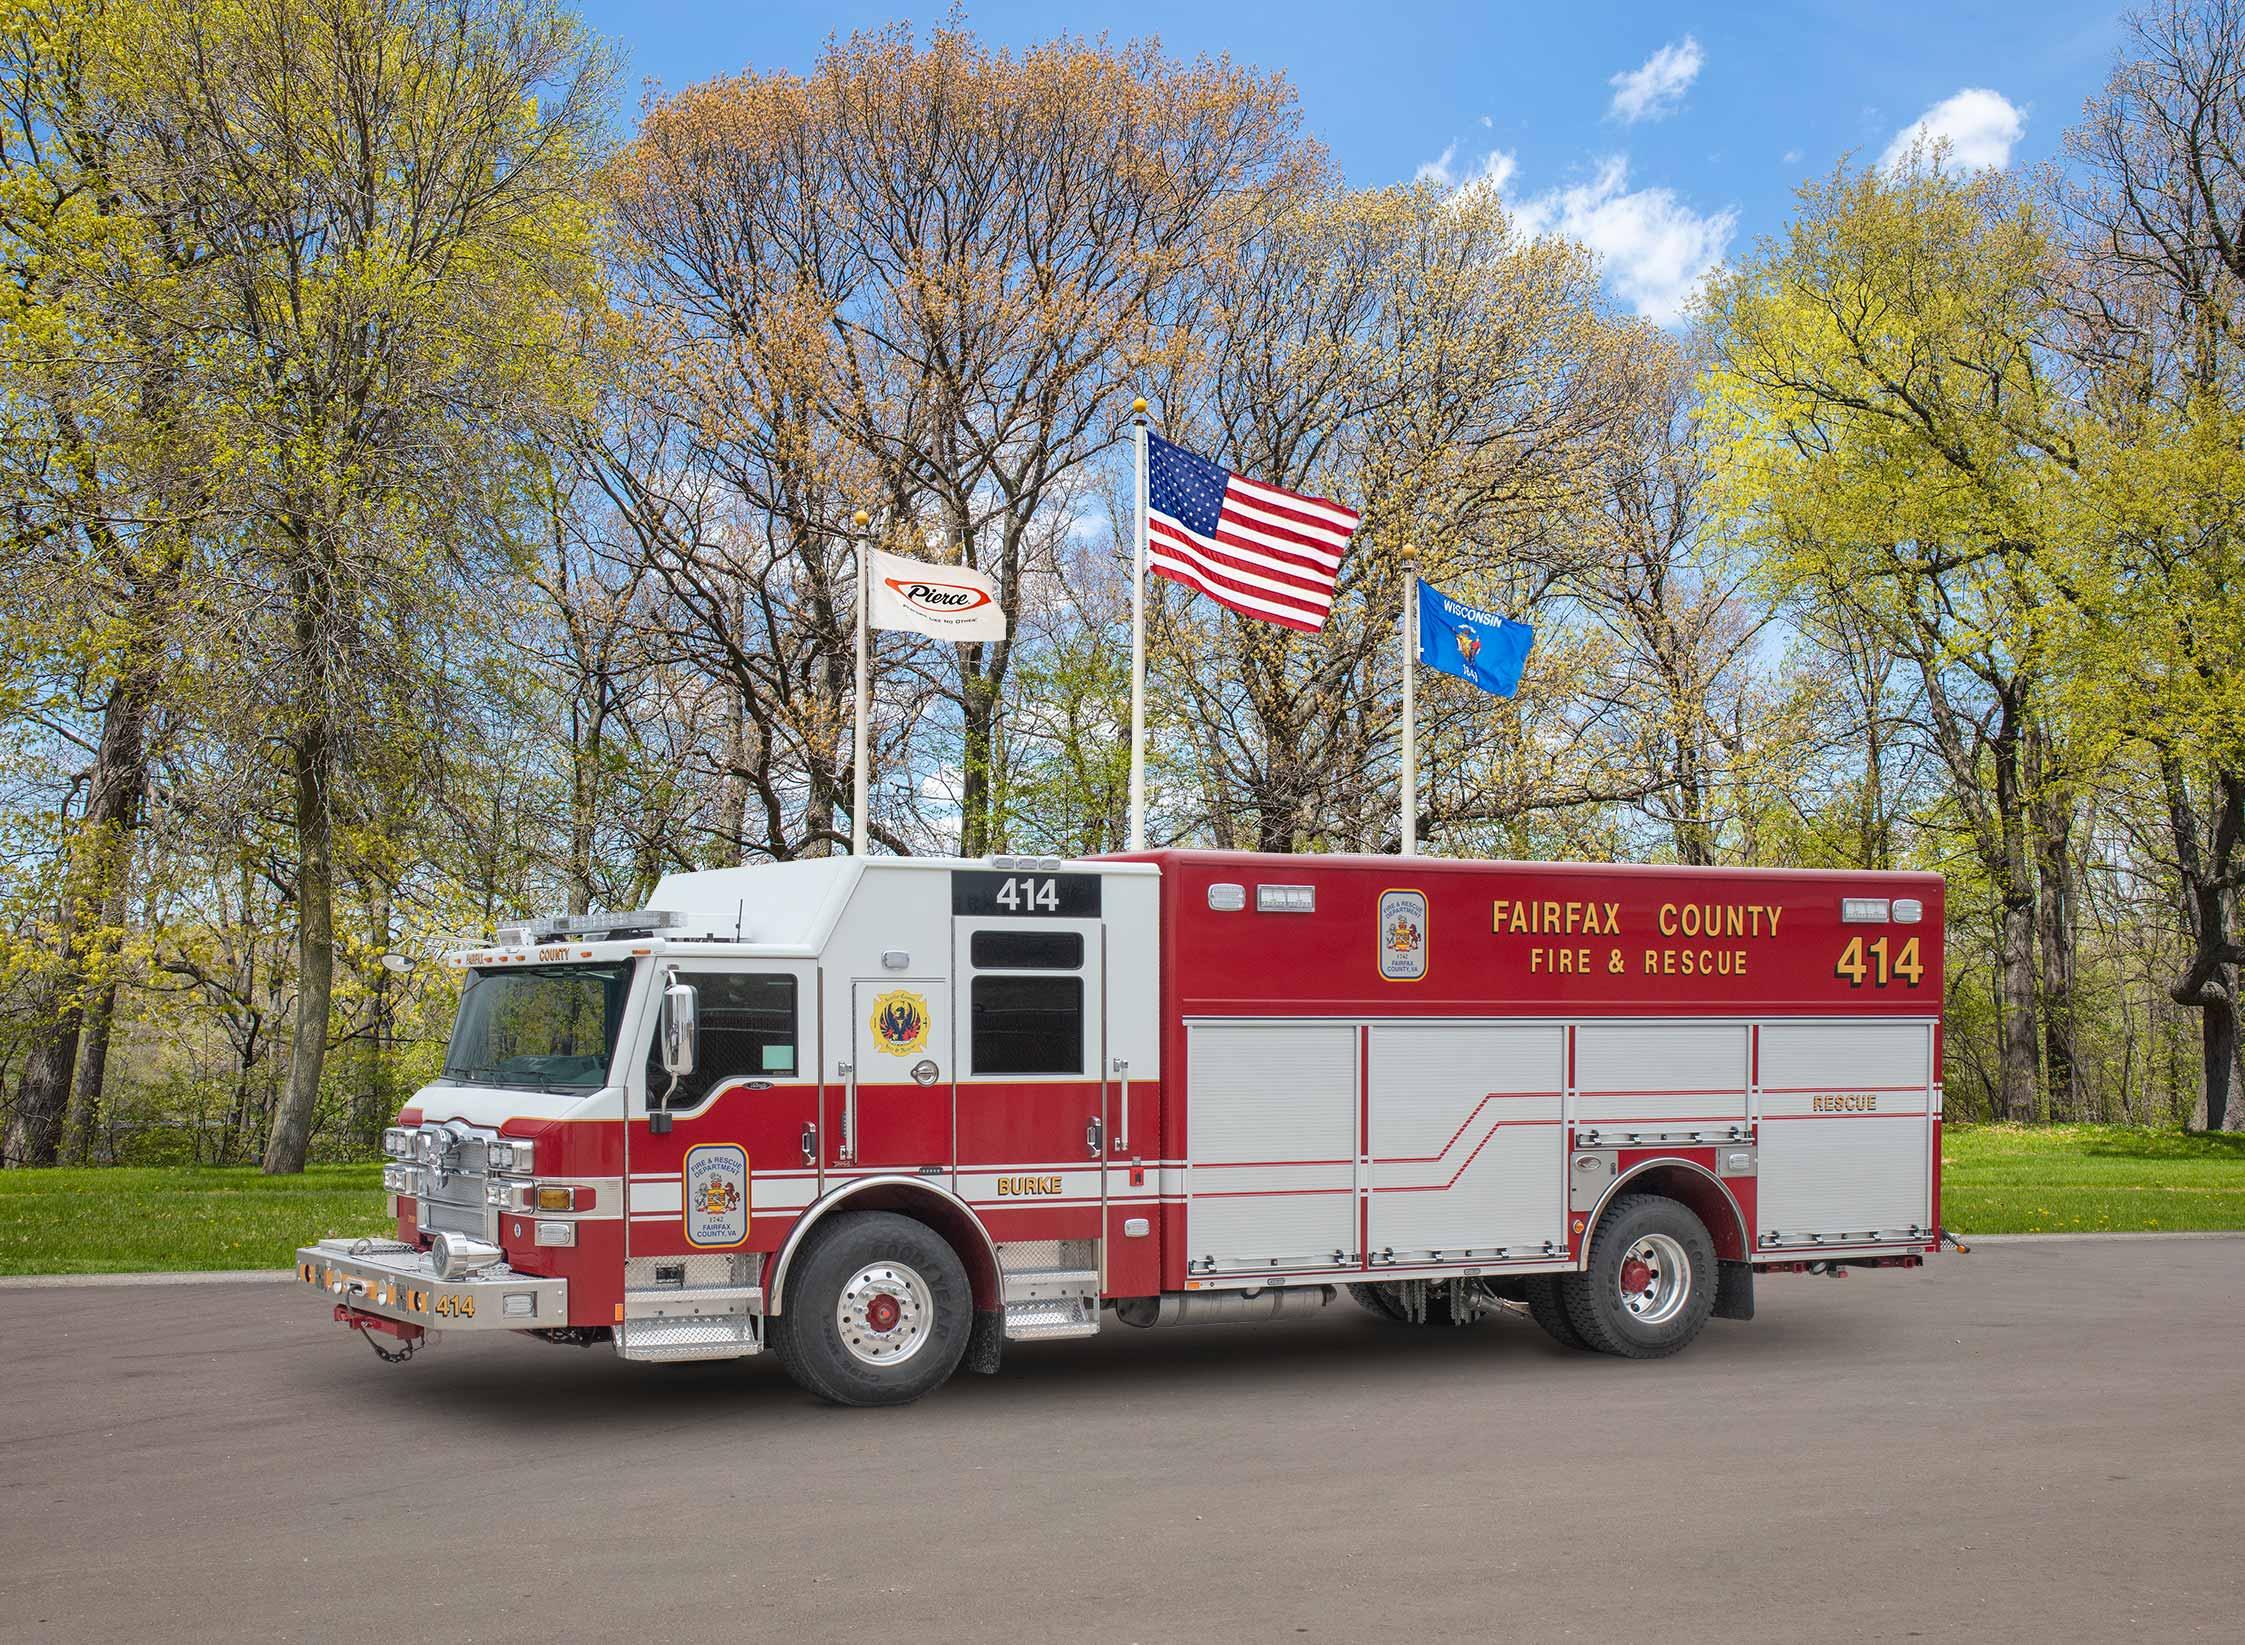 Fairfax County Fire & Rescue Department - Rescue